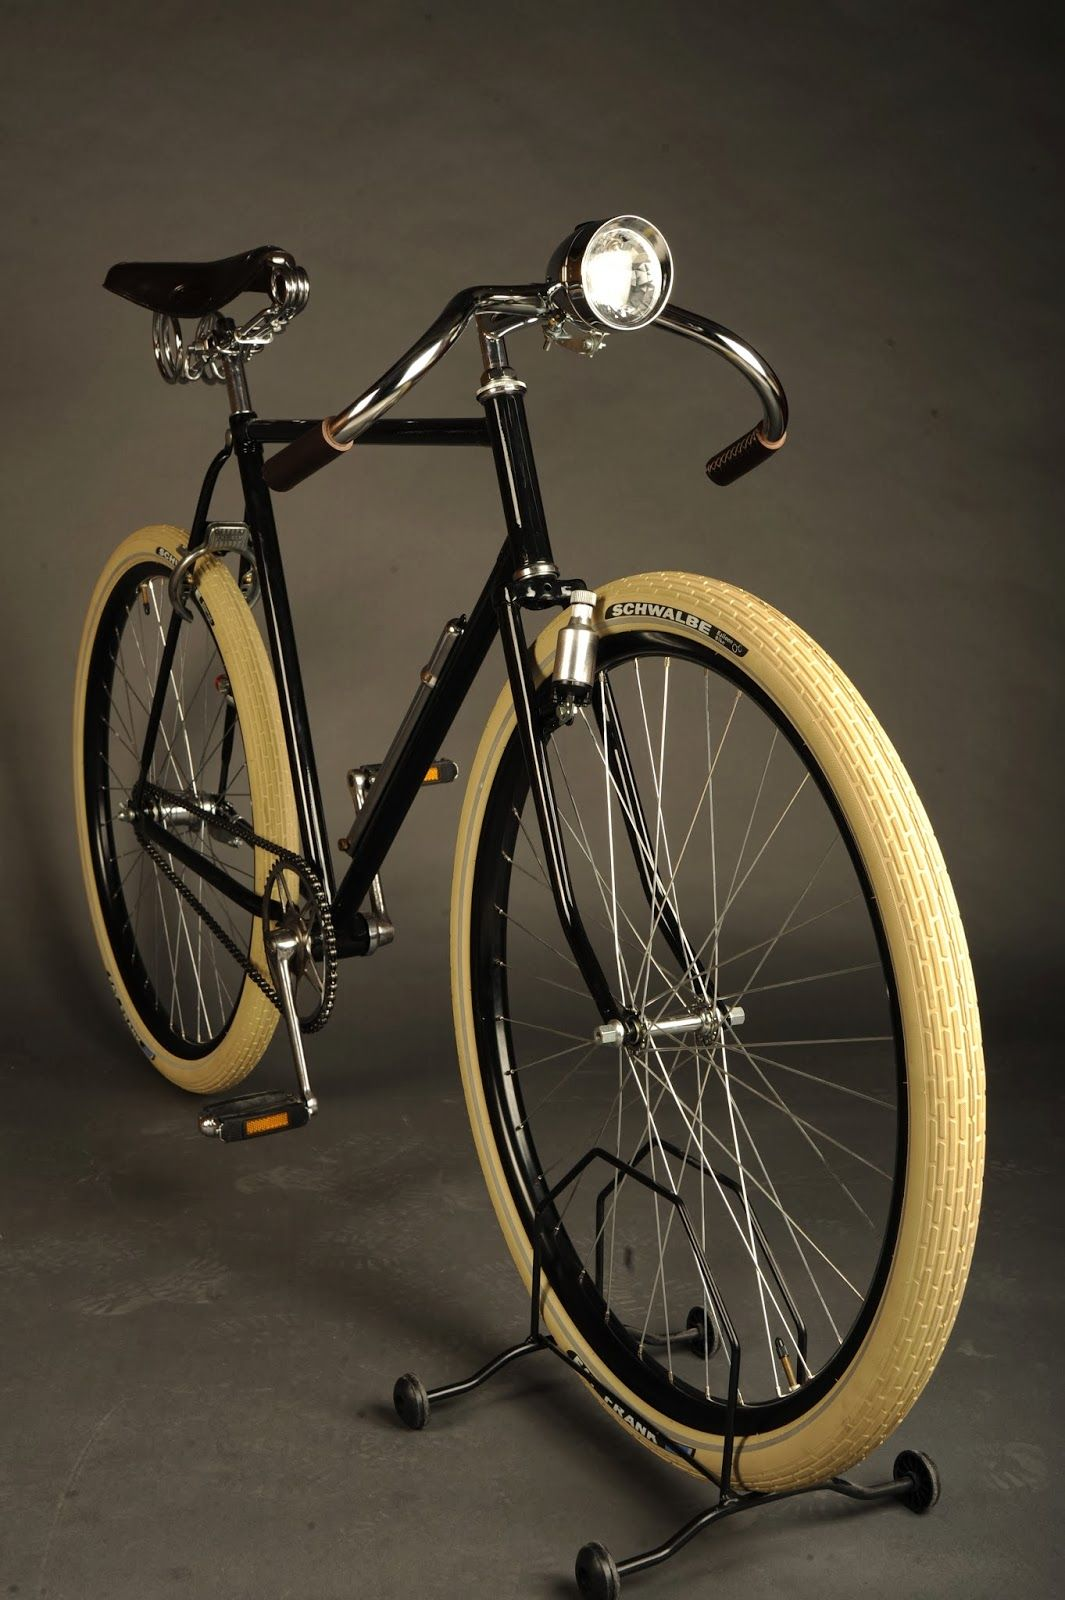 BICICLETAS CLÁSICAS LEO | BCL Path Racer No. 001 ........ This bike ...